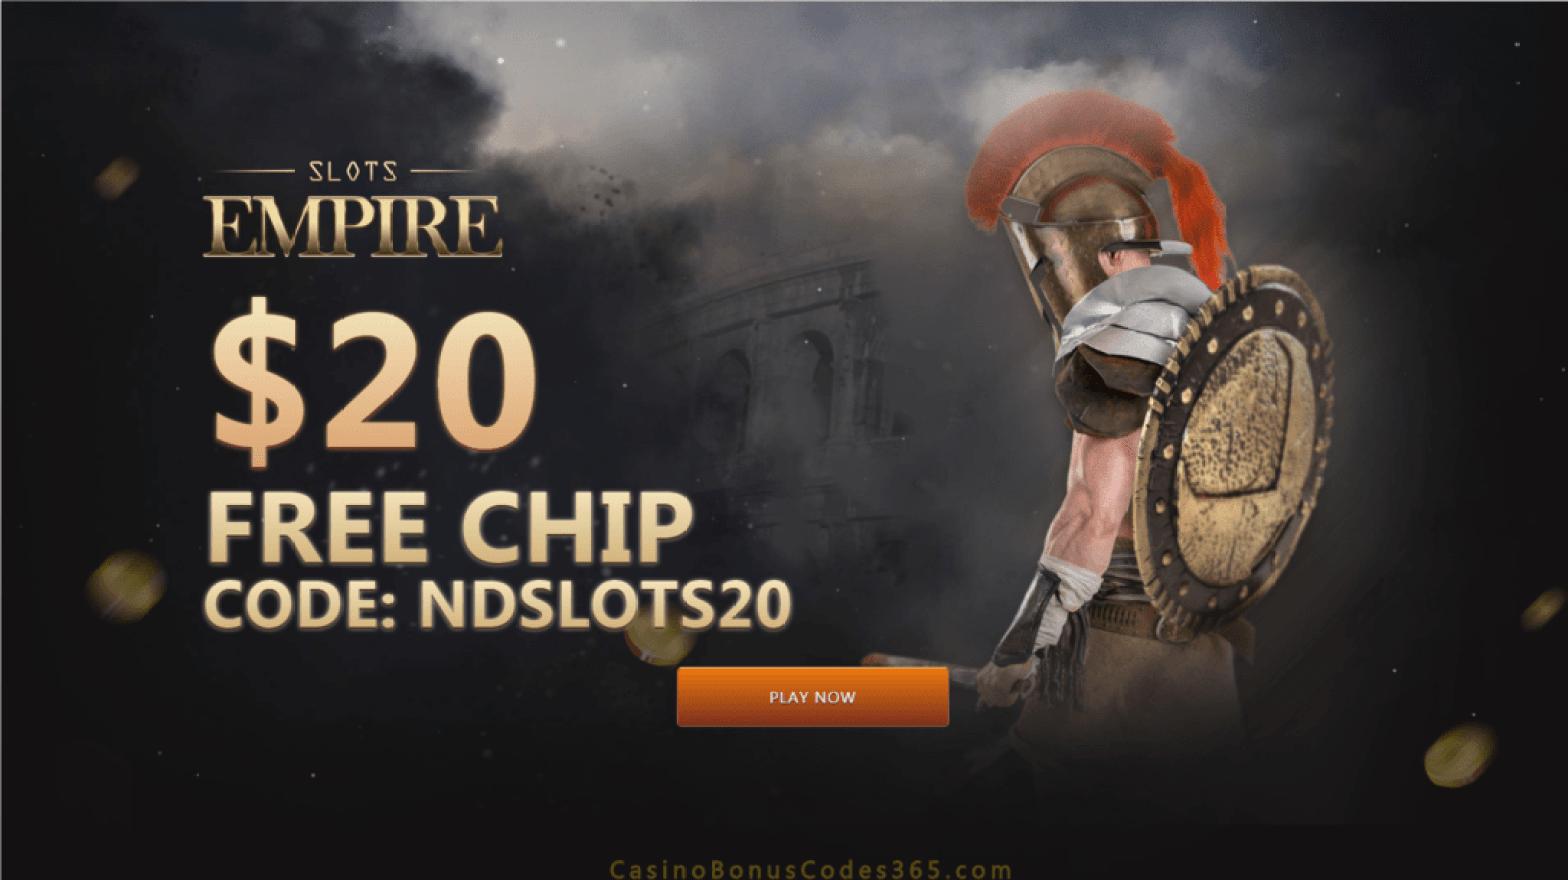 Slots Empire $20 FREE Chip Exclusive Sign Up Bonus